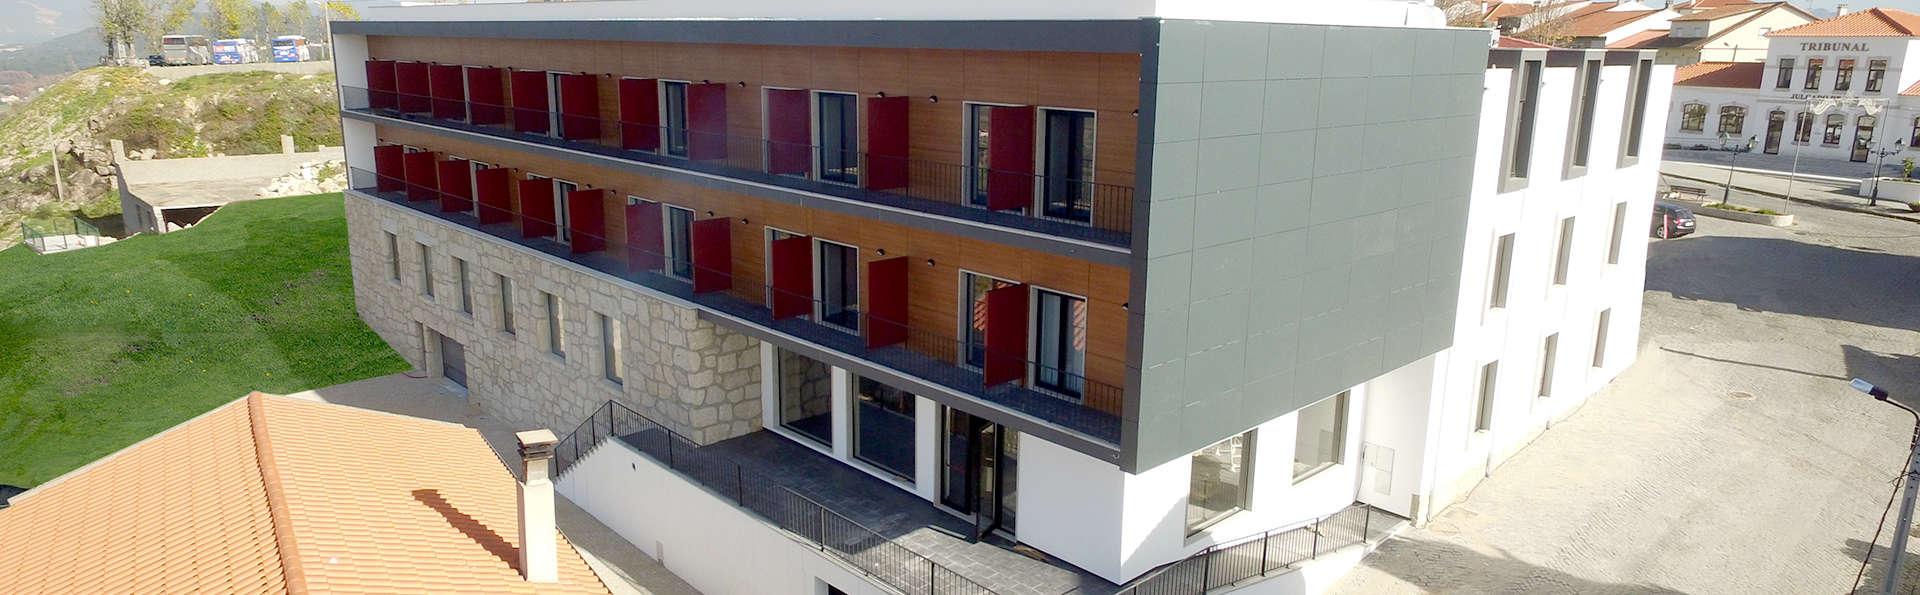 Belmonte Sinai Hotel - Edit_Front6.jpg